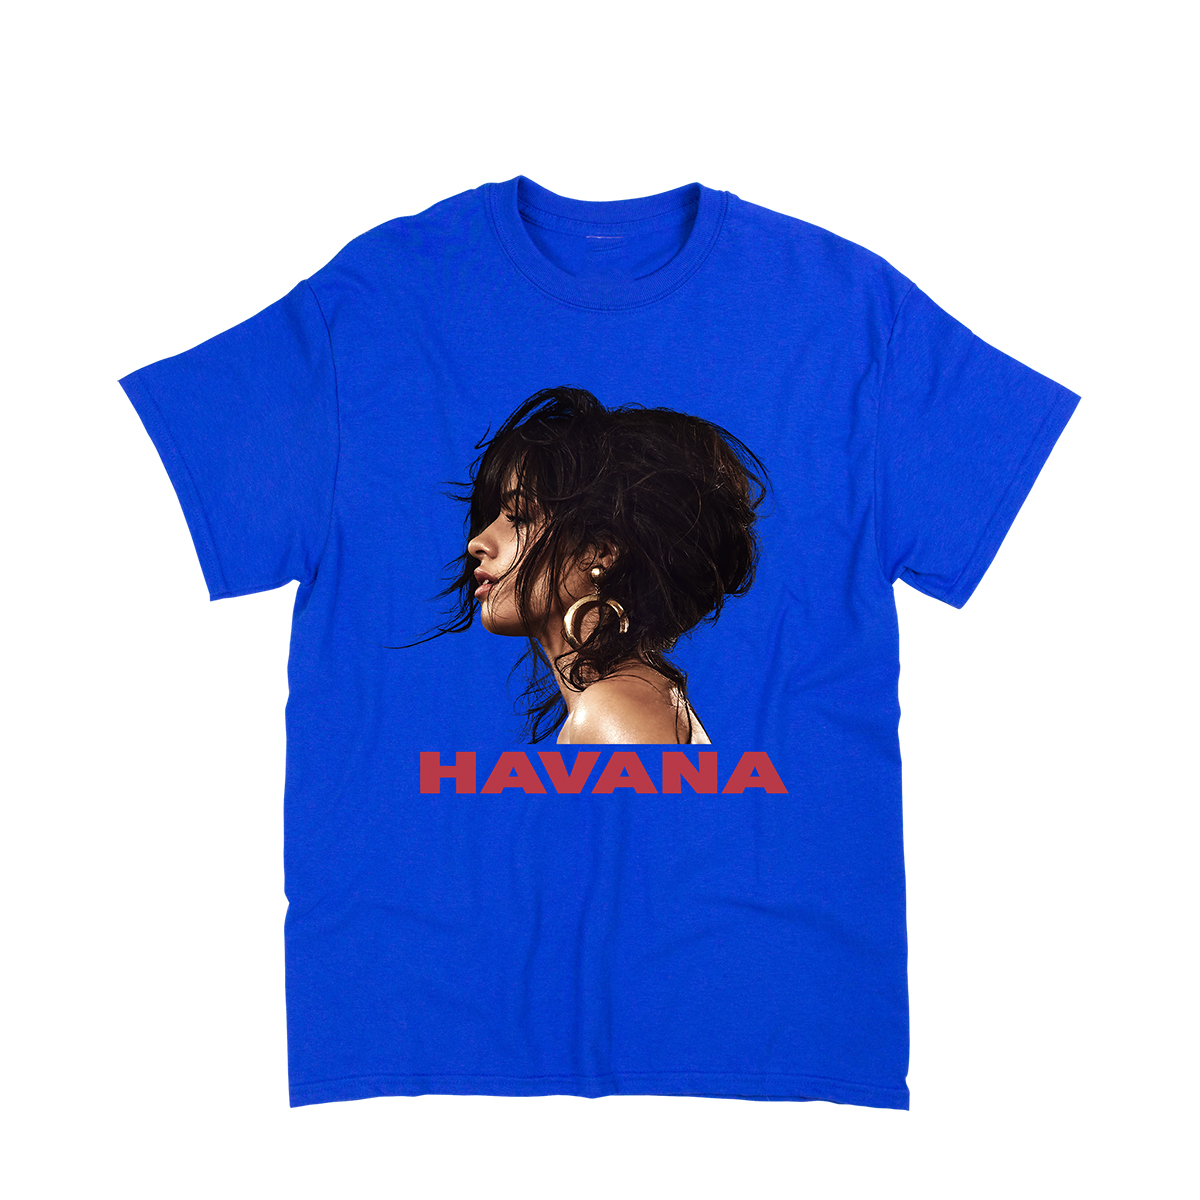 Havana T-shirt